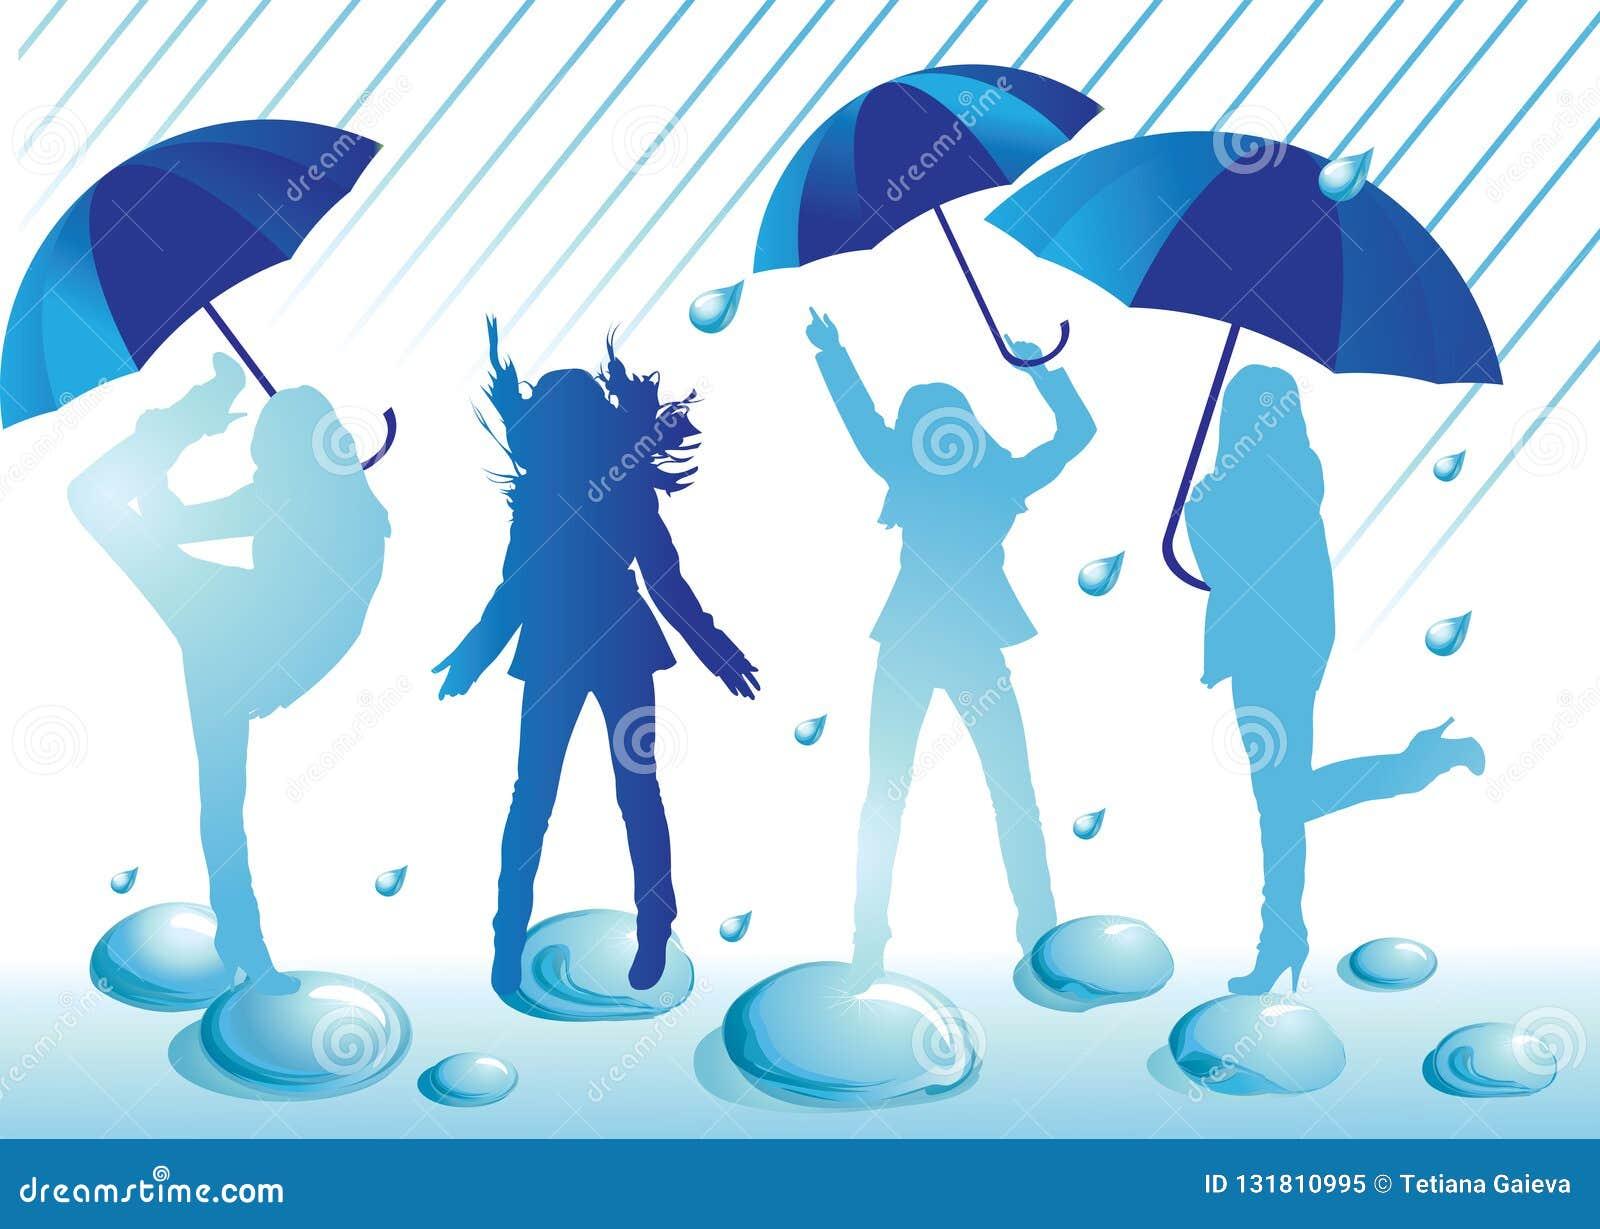 Female silhouettes having fun under the open umbrellas in the rain.